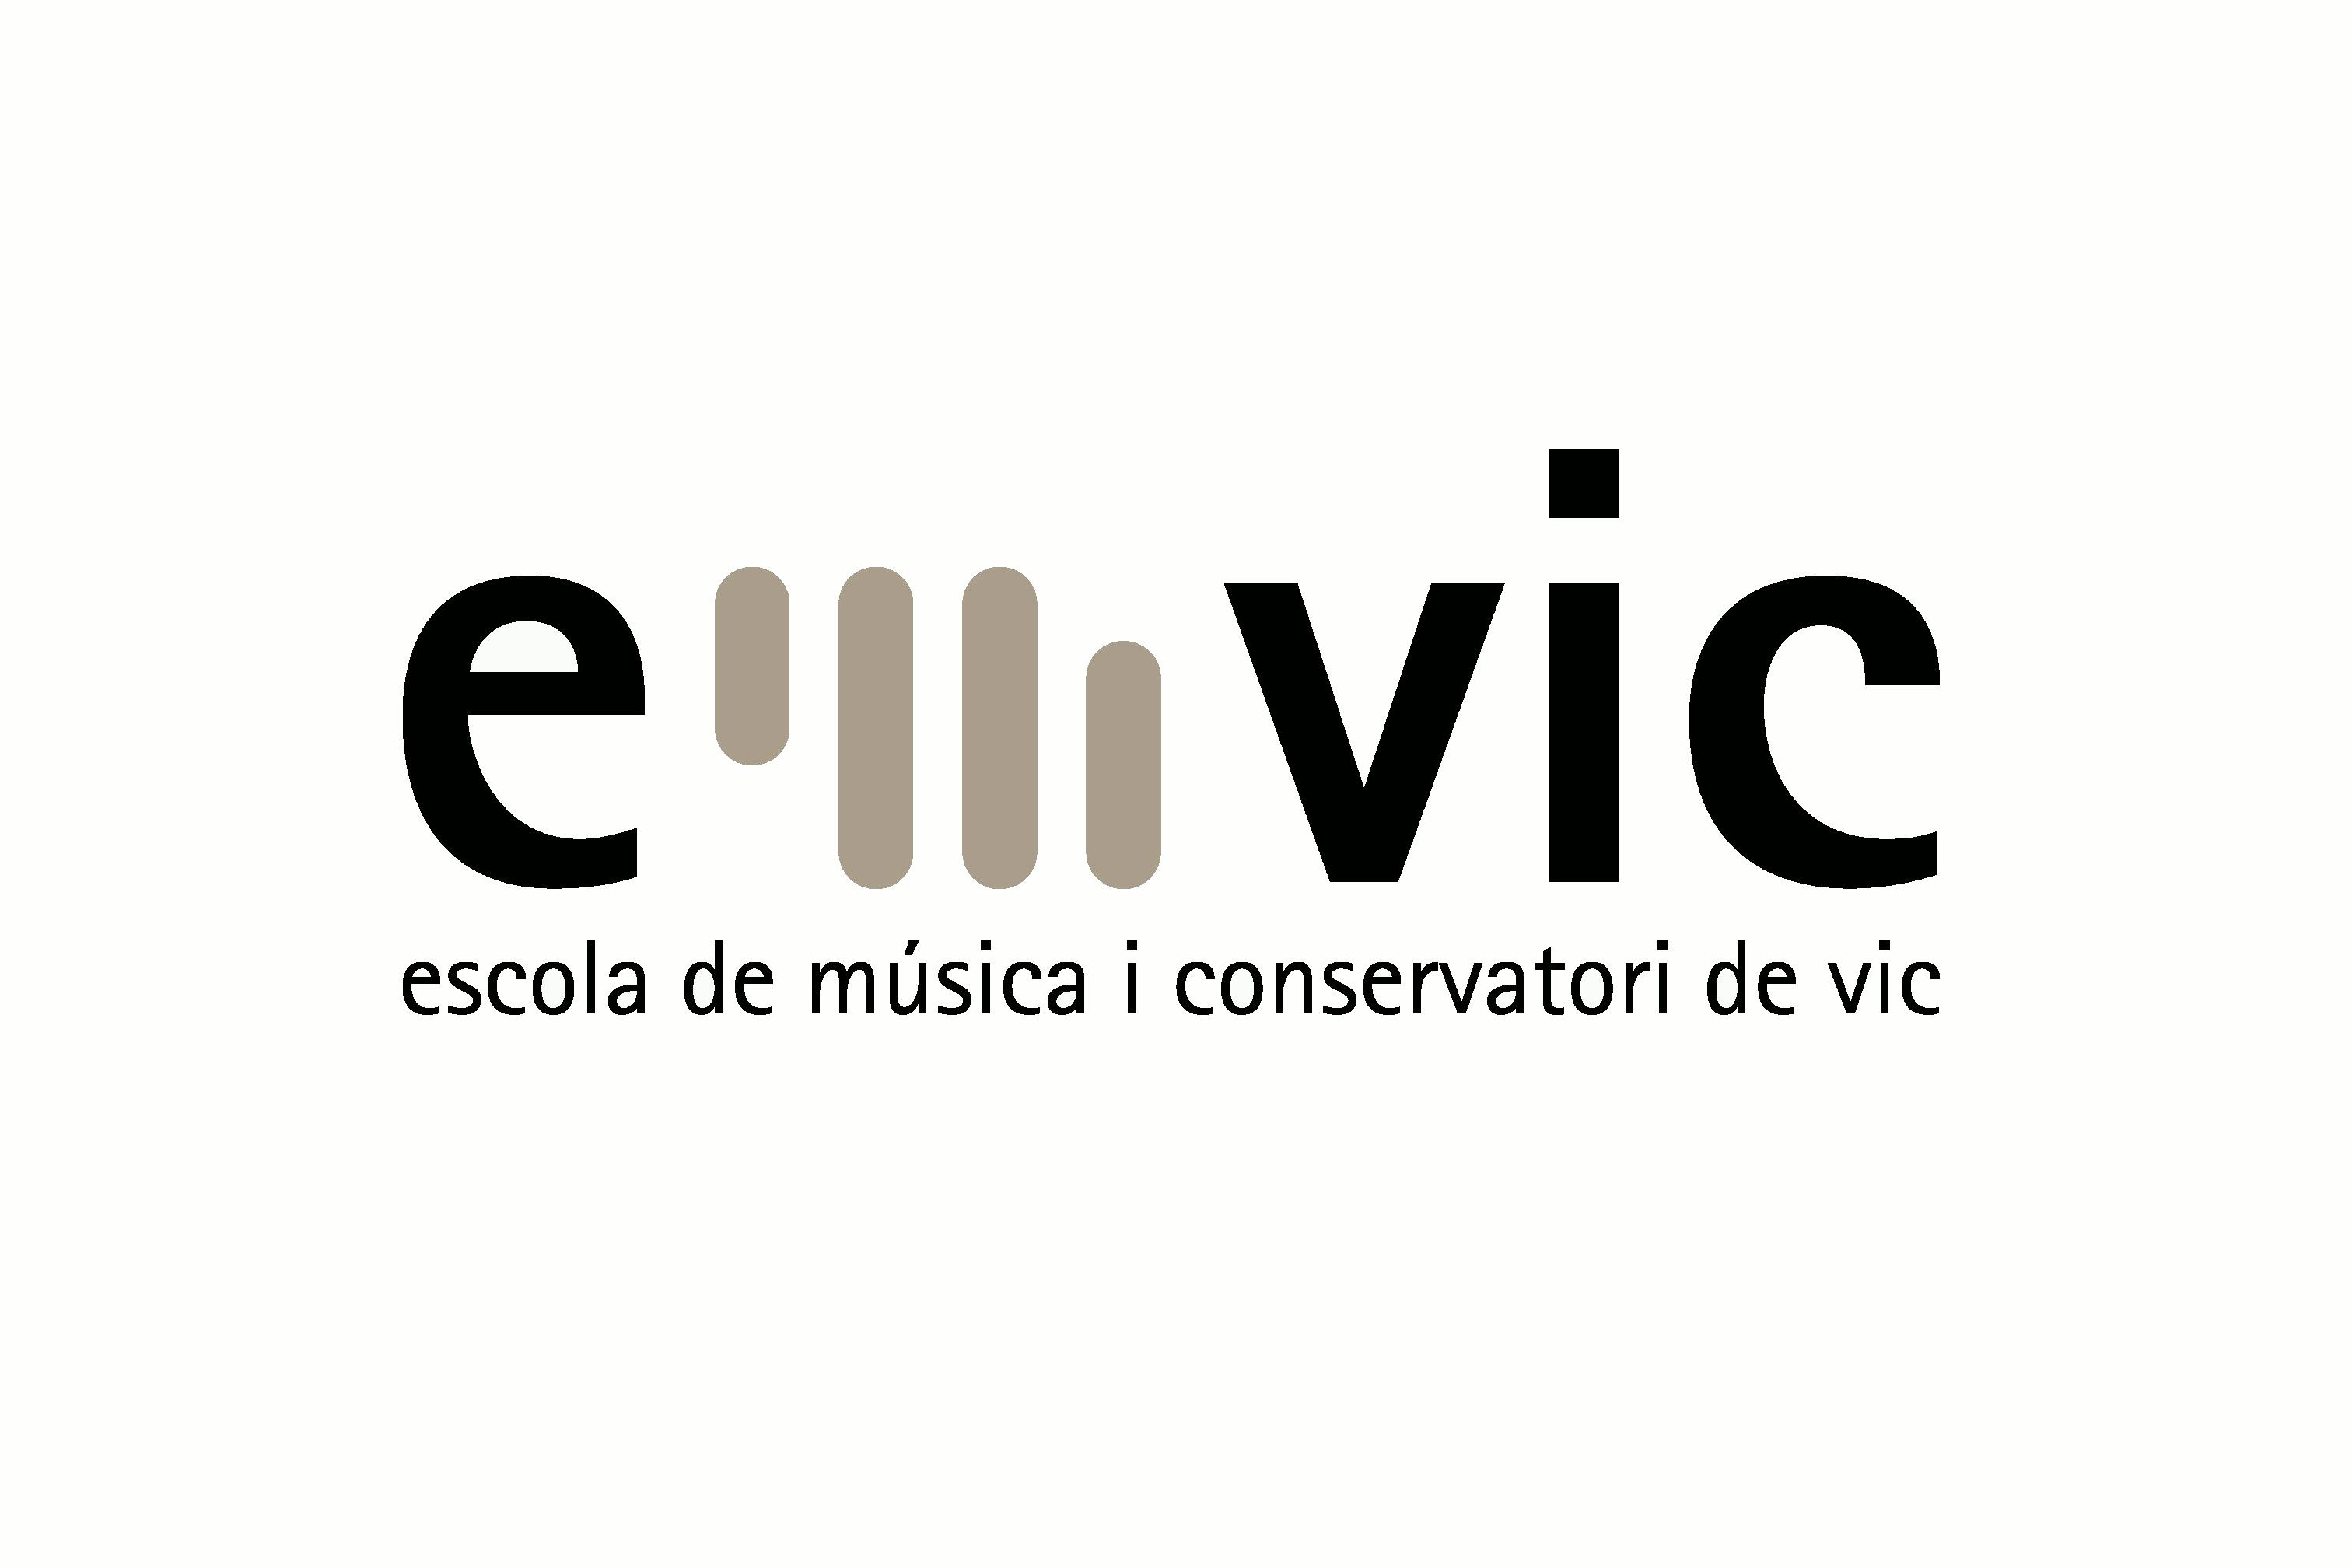 EMVIC logo